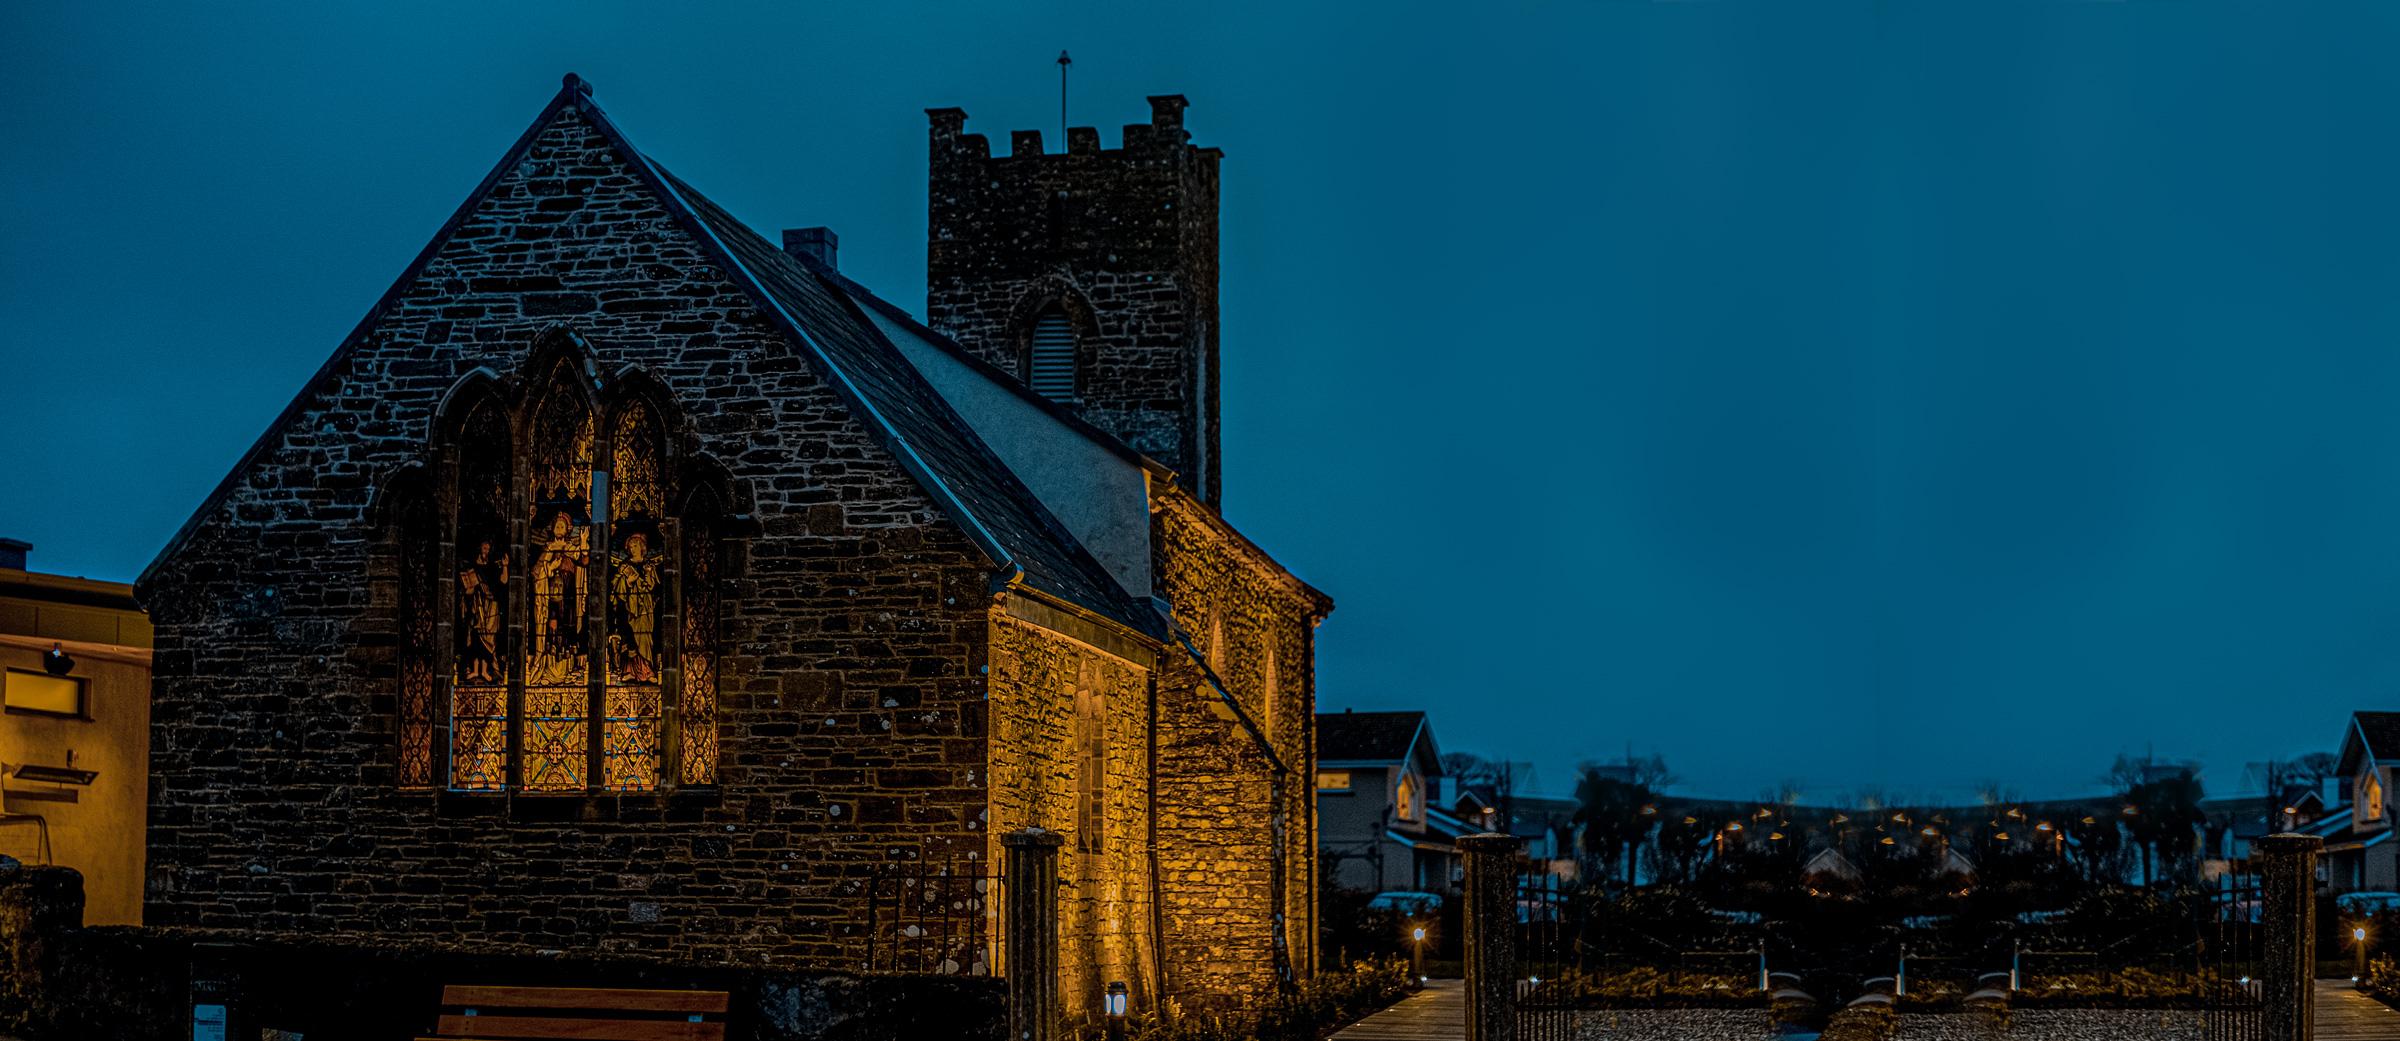 The Sea Church restaurant and bar, Ballycotton, Co. Cork